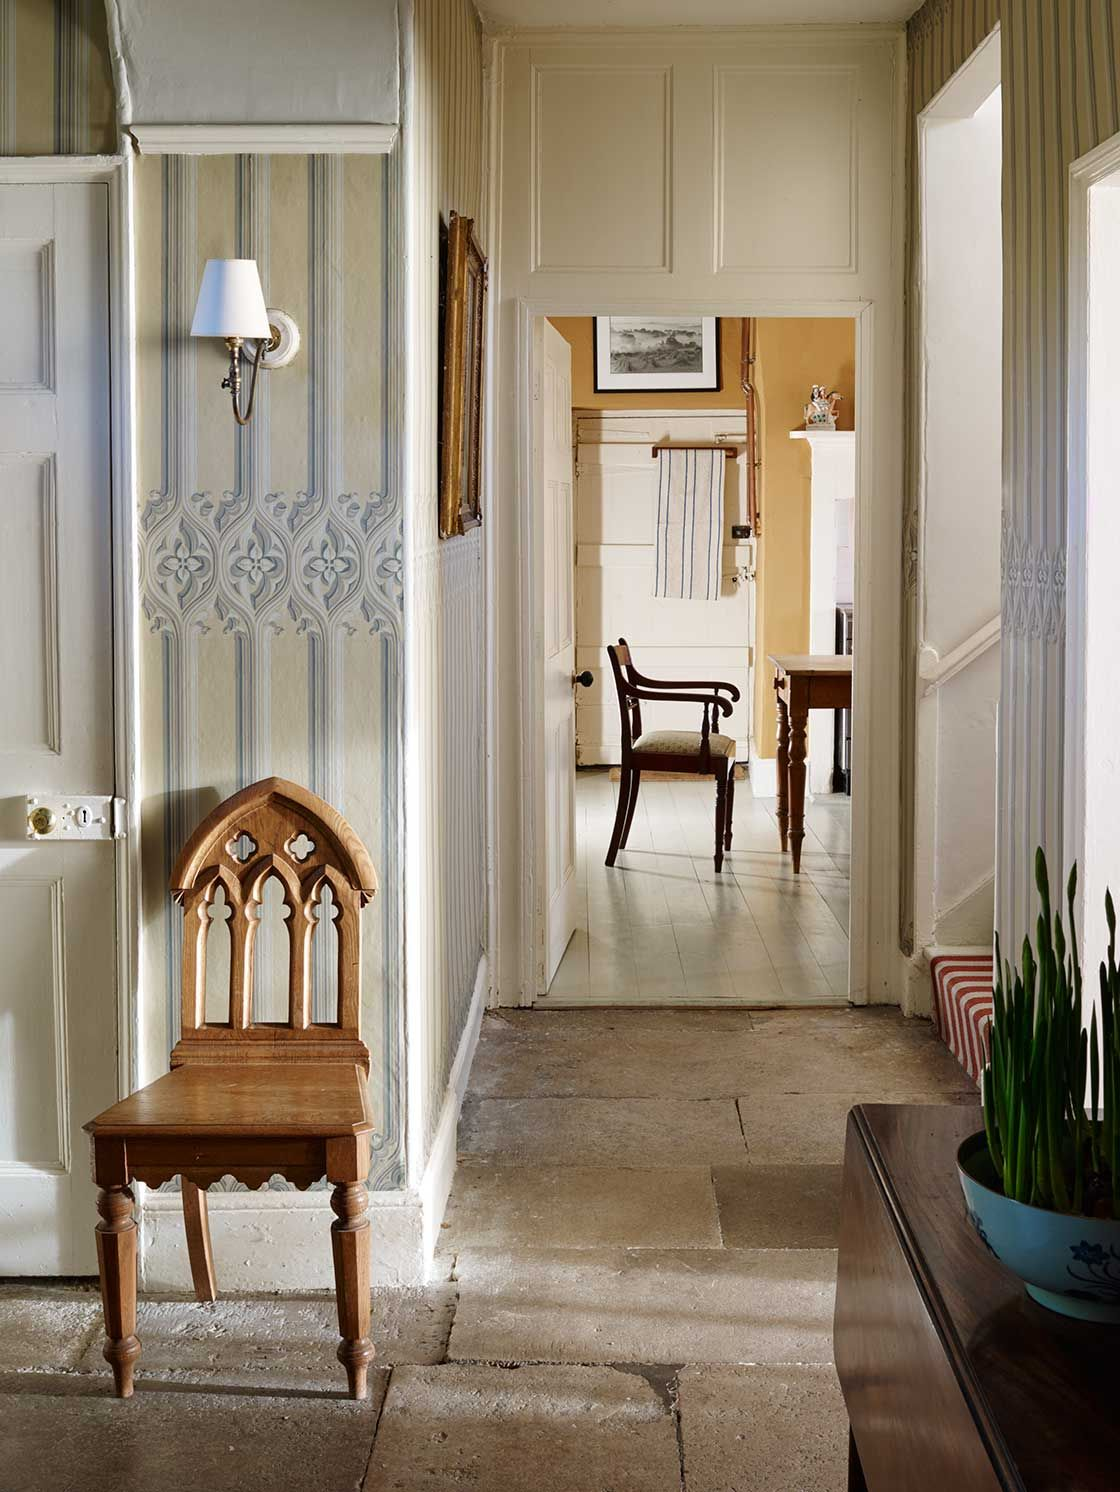 Best The Old Parsonage Home Interior Design English Decor 400 x 300